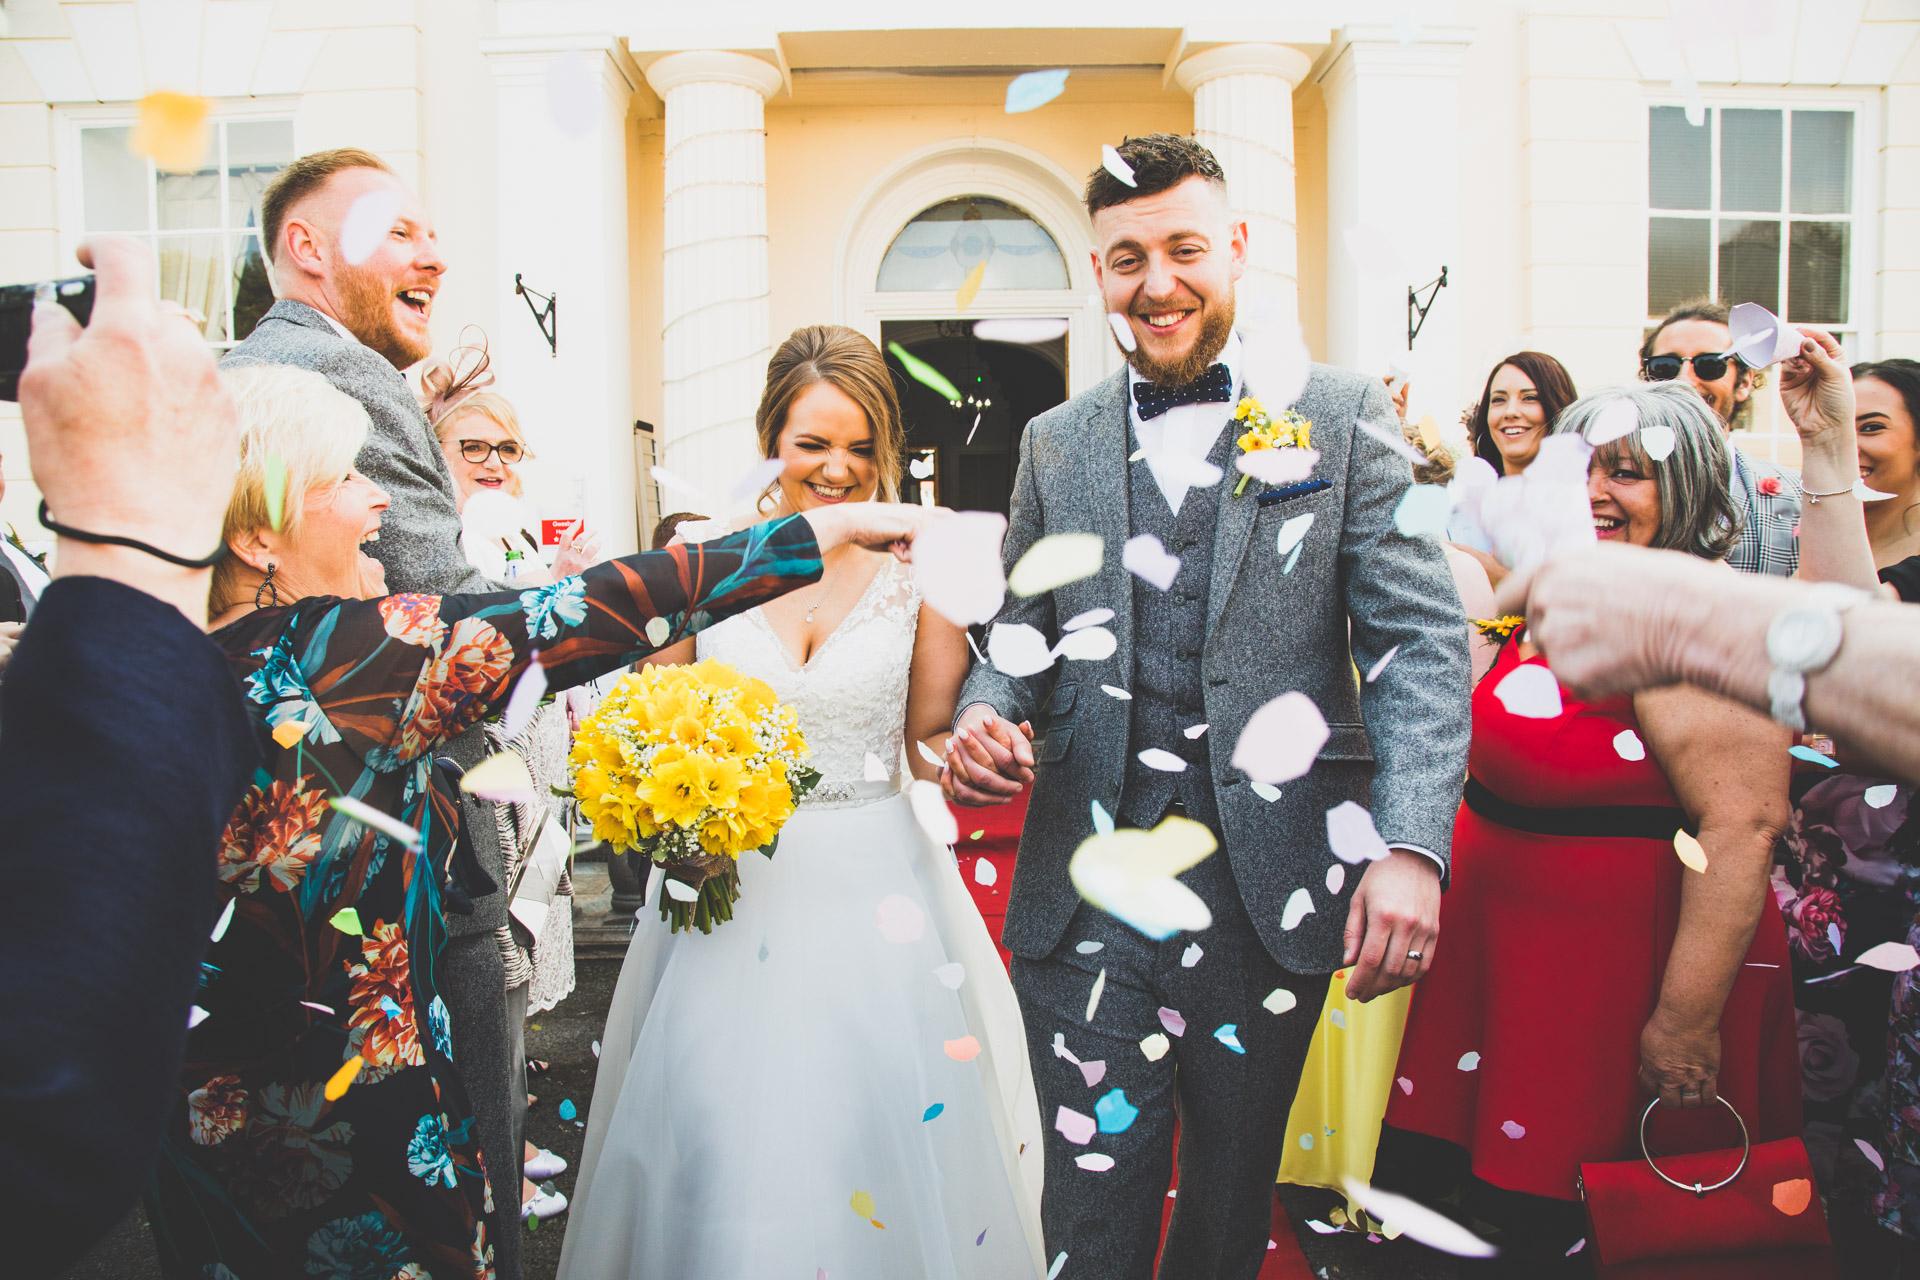 021 Cardiff Wedding Photographers christopherpaulweddings.com 0553.jpg